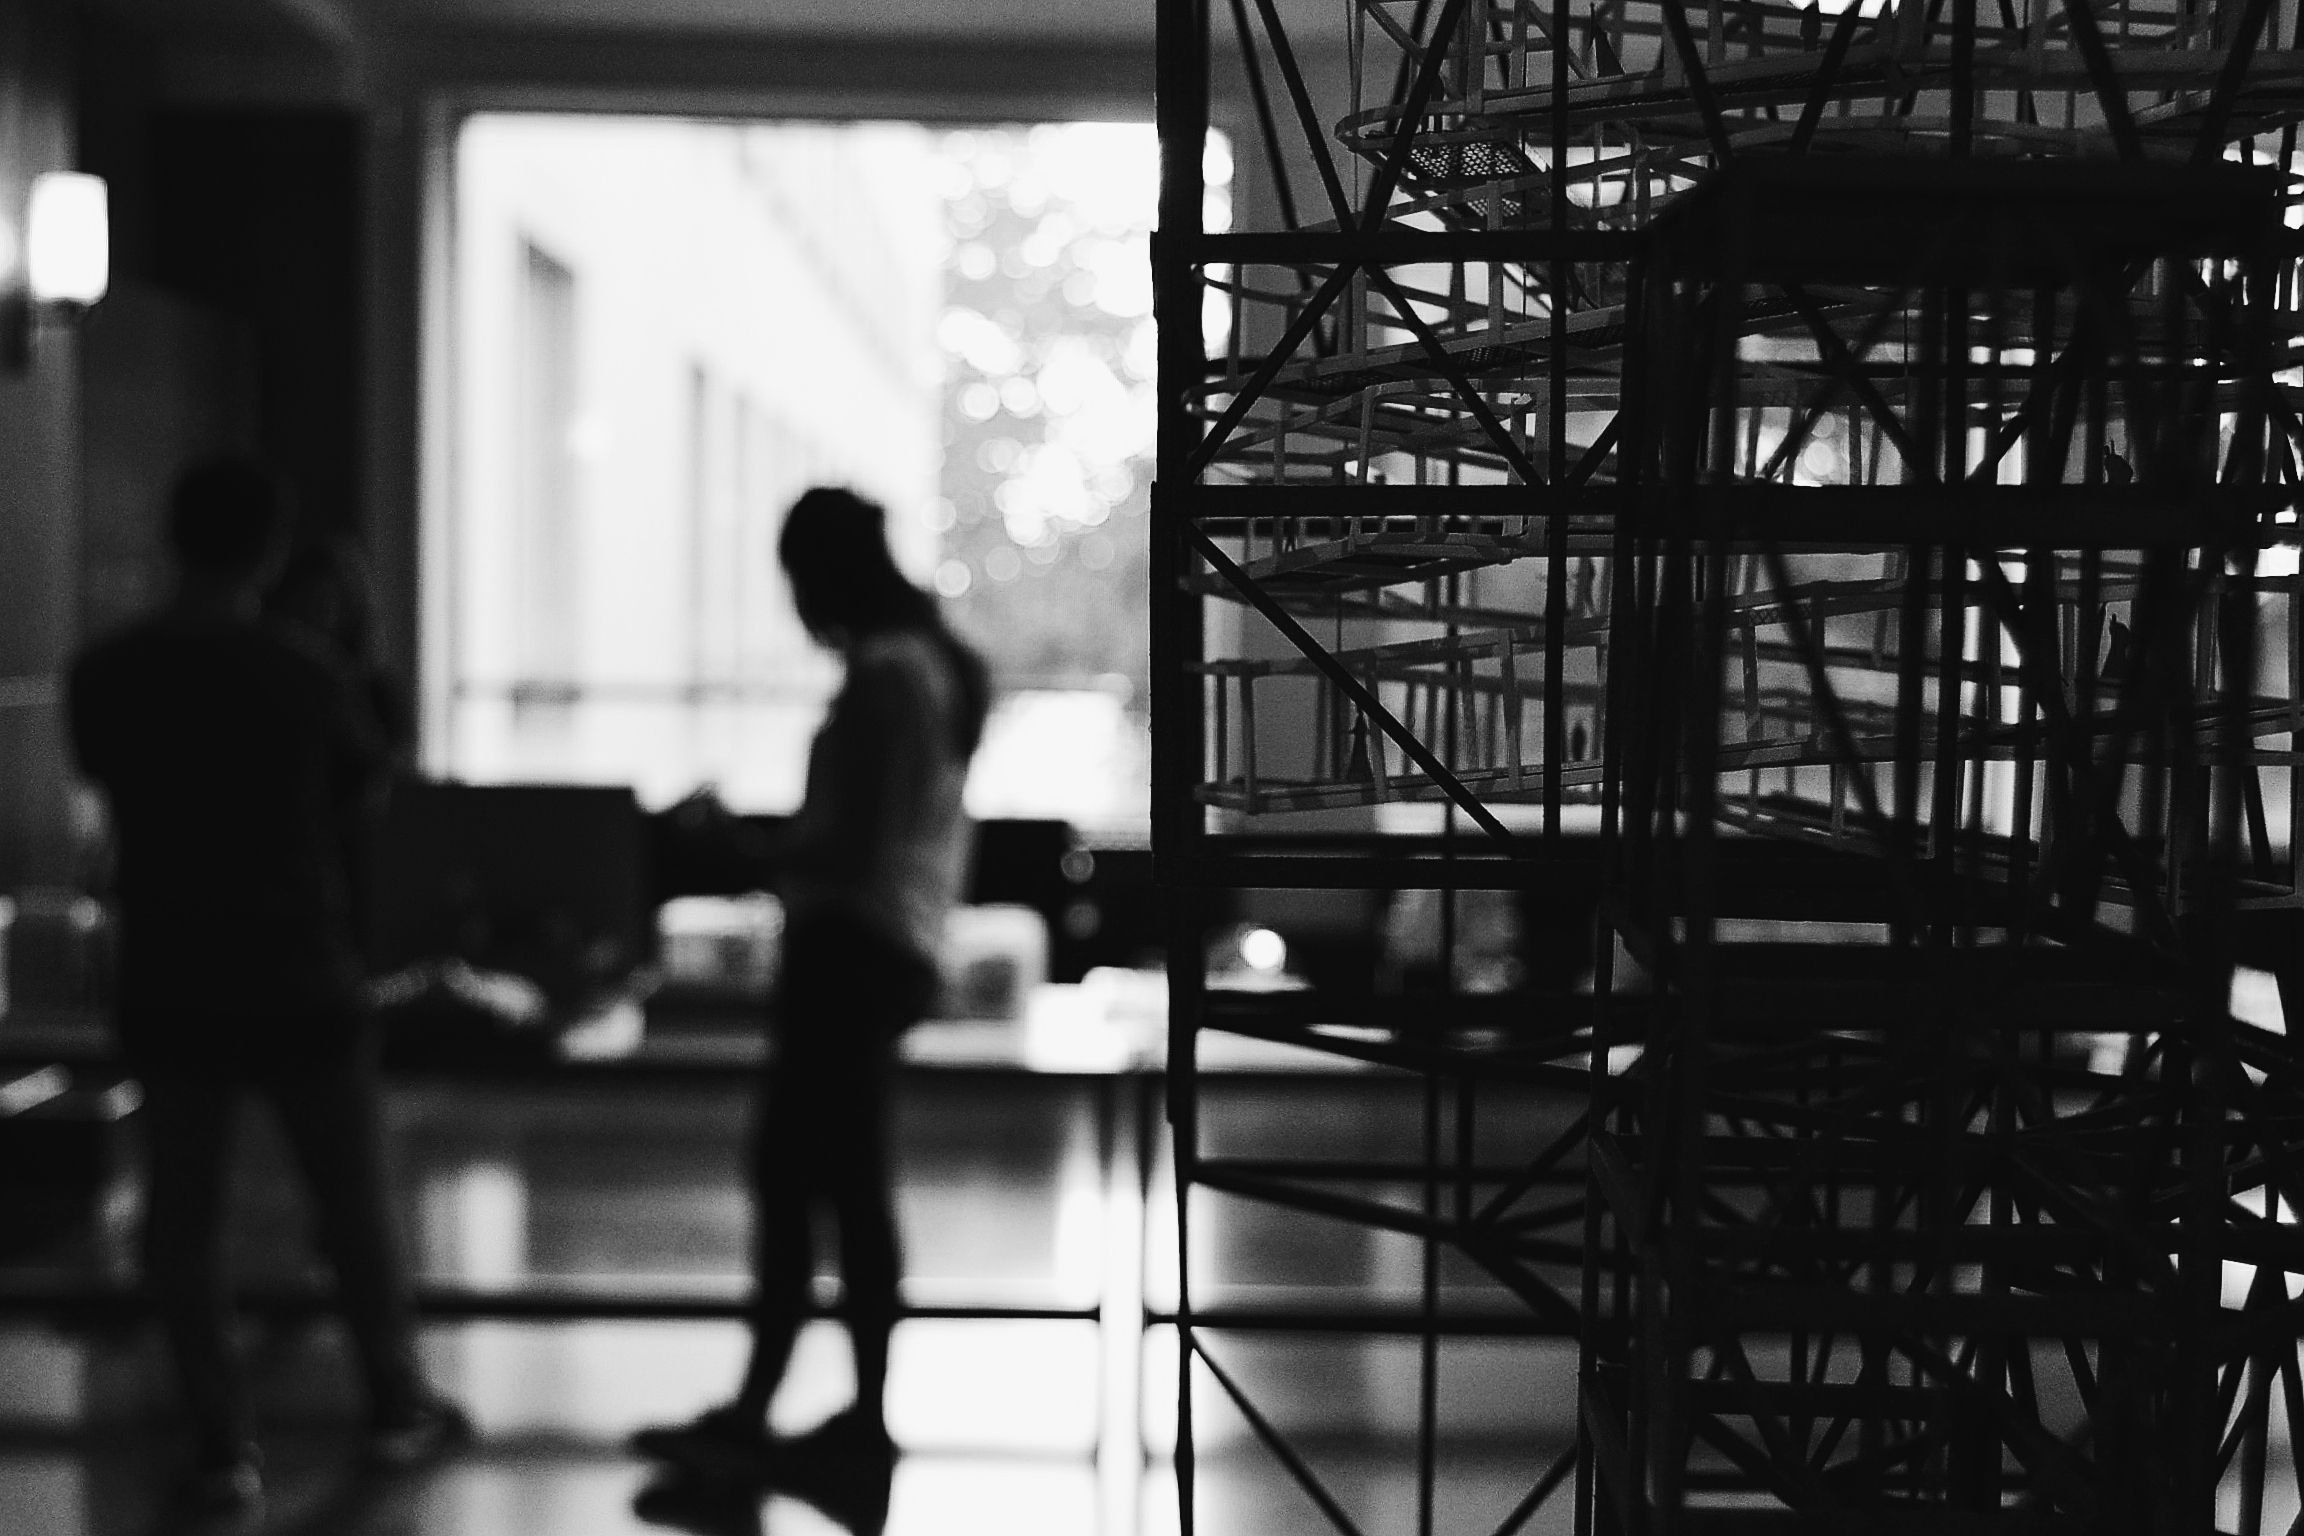 TER Ej 3 El alma del mueble Chaise longue Le Corbusier Dibujos técnicos TER ETSAM UPM